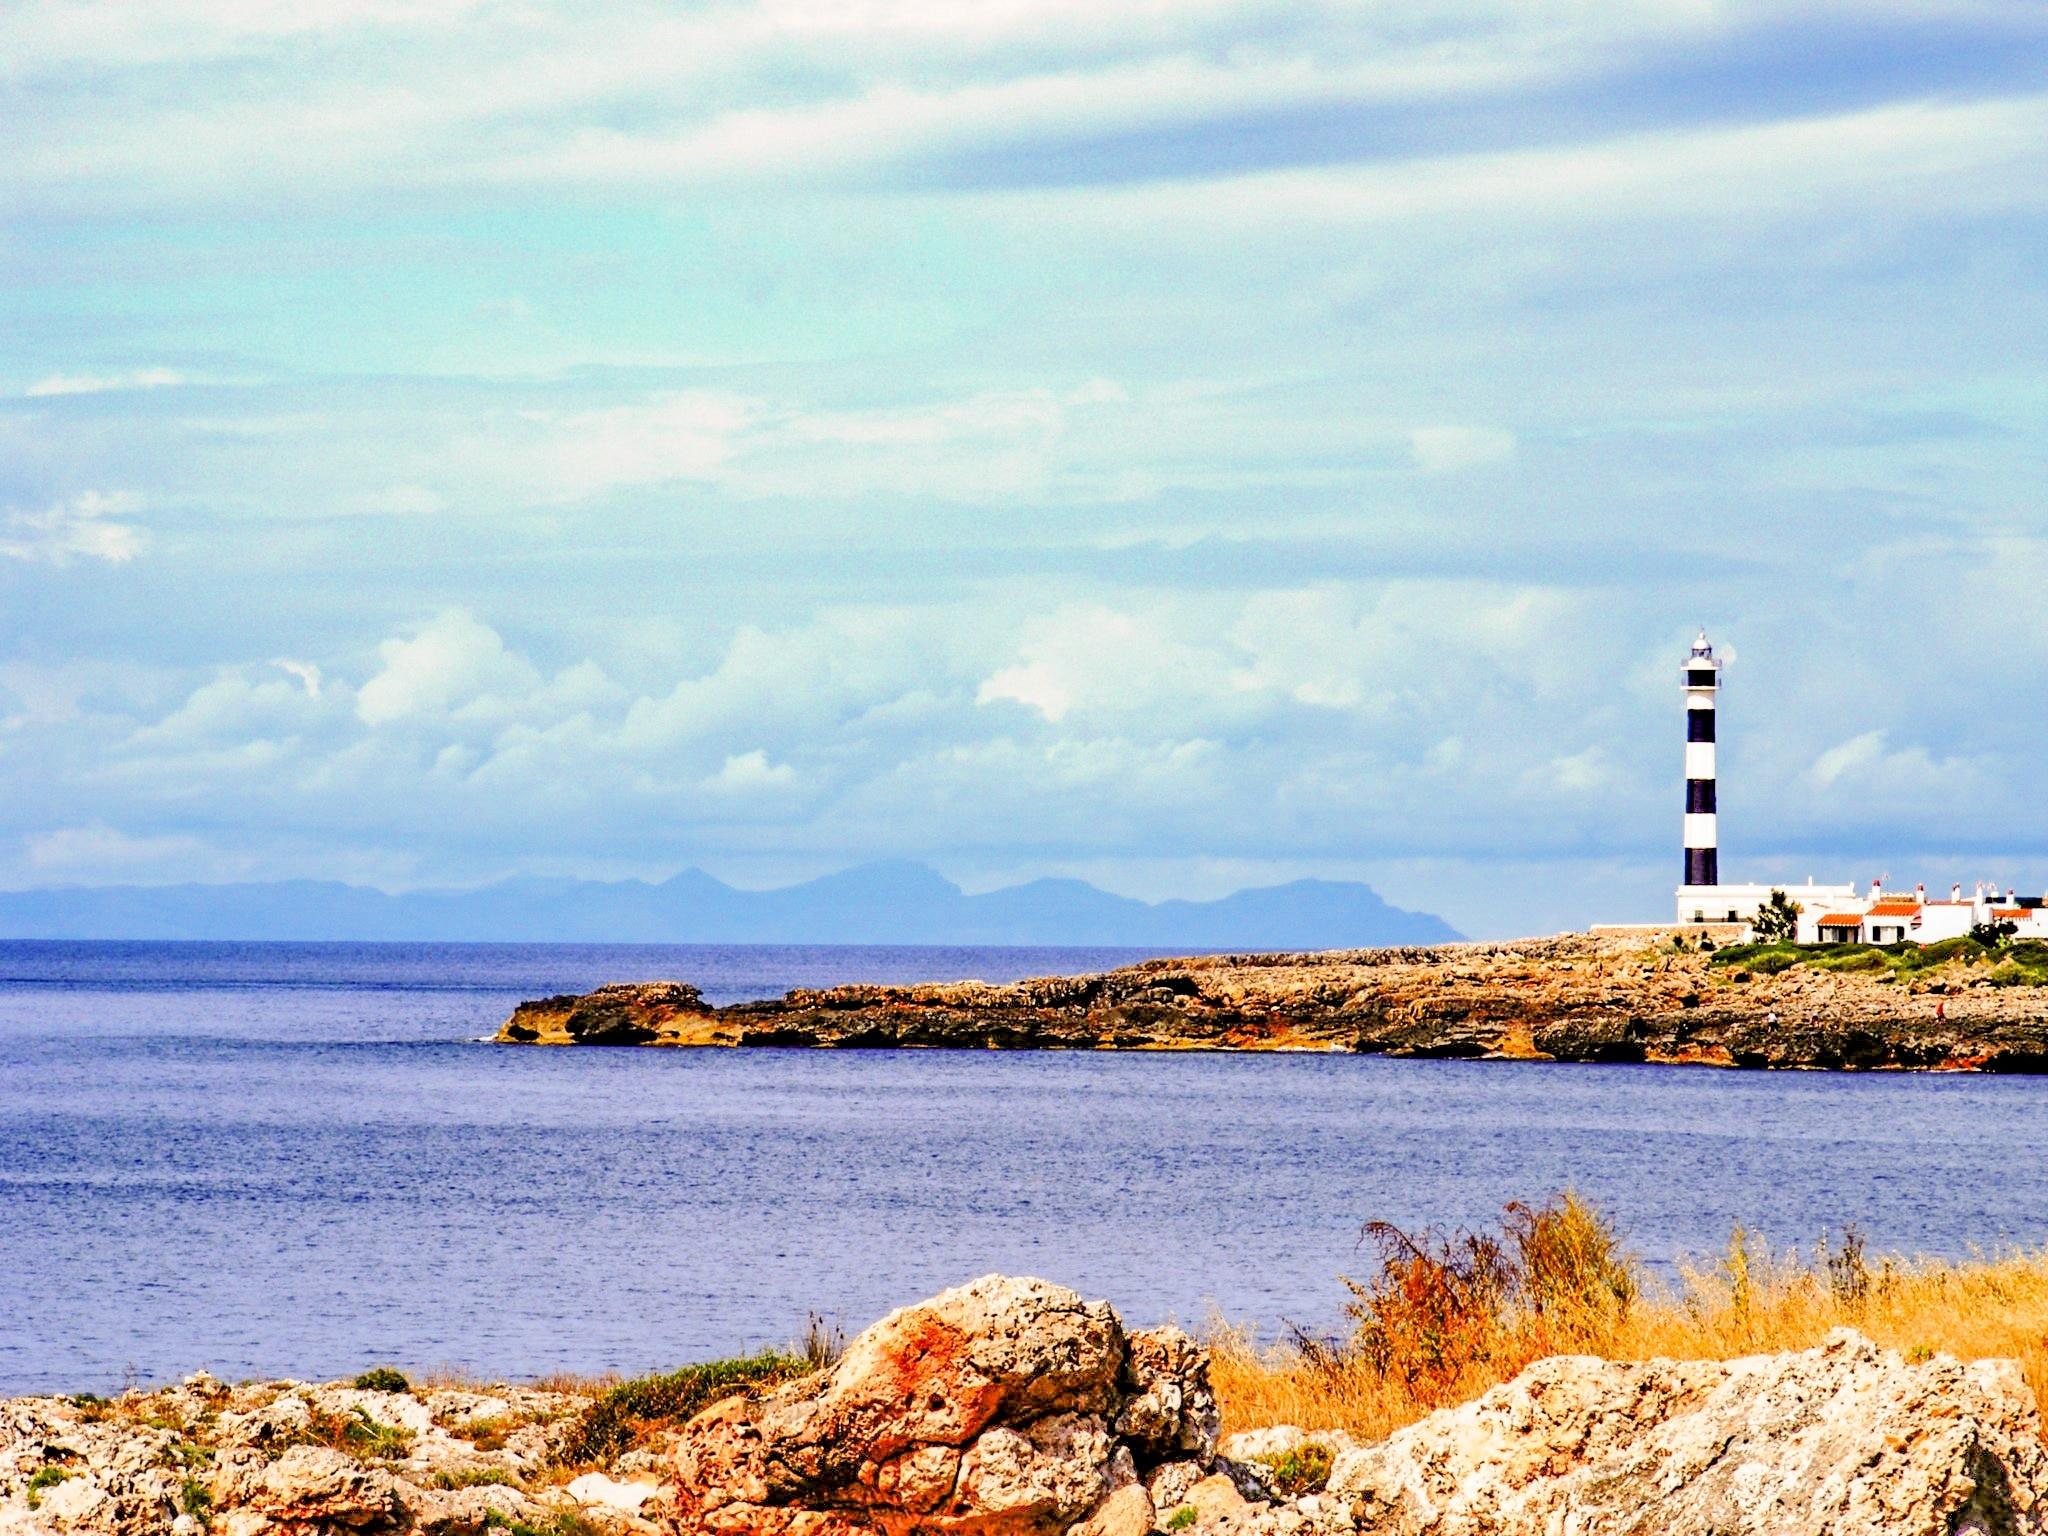 Cap d'Artrutx, Ciutadella de Menorca, Balearic Islands, Spain